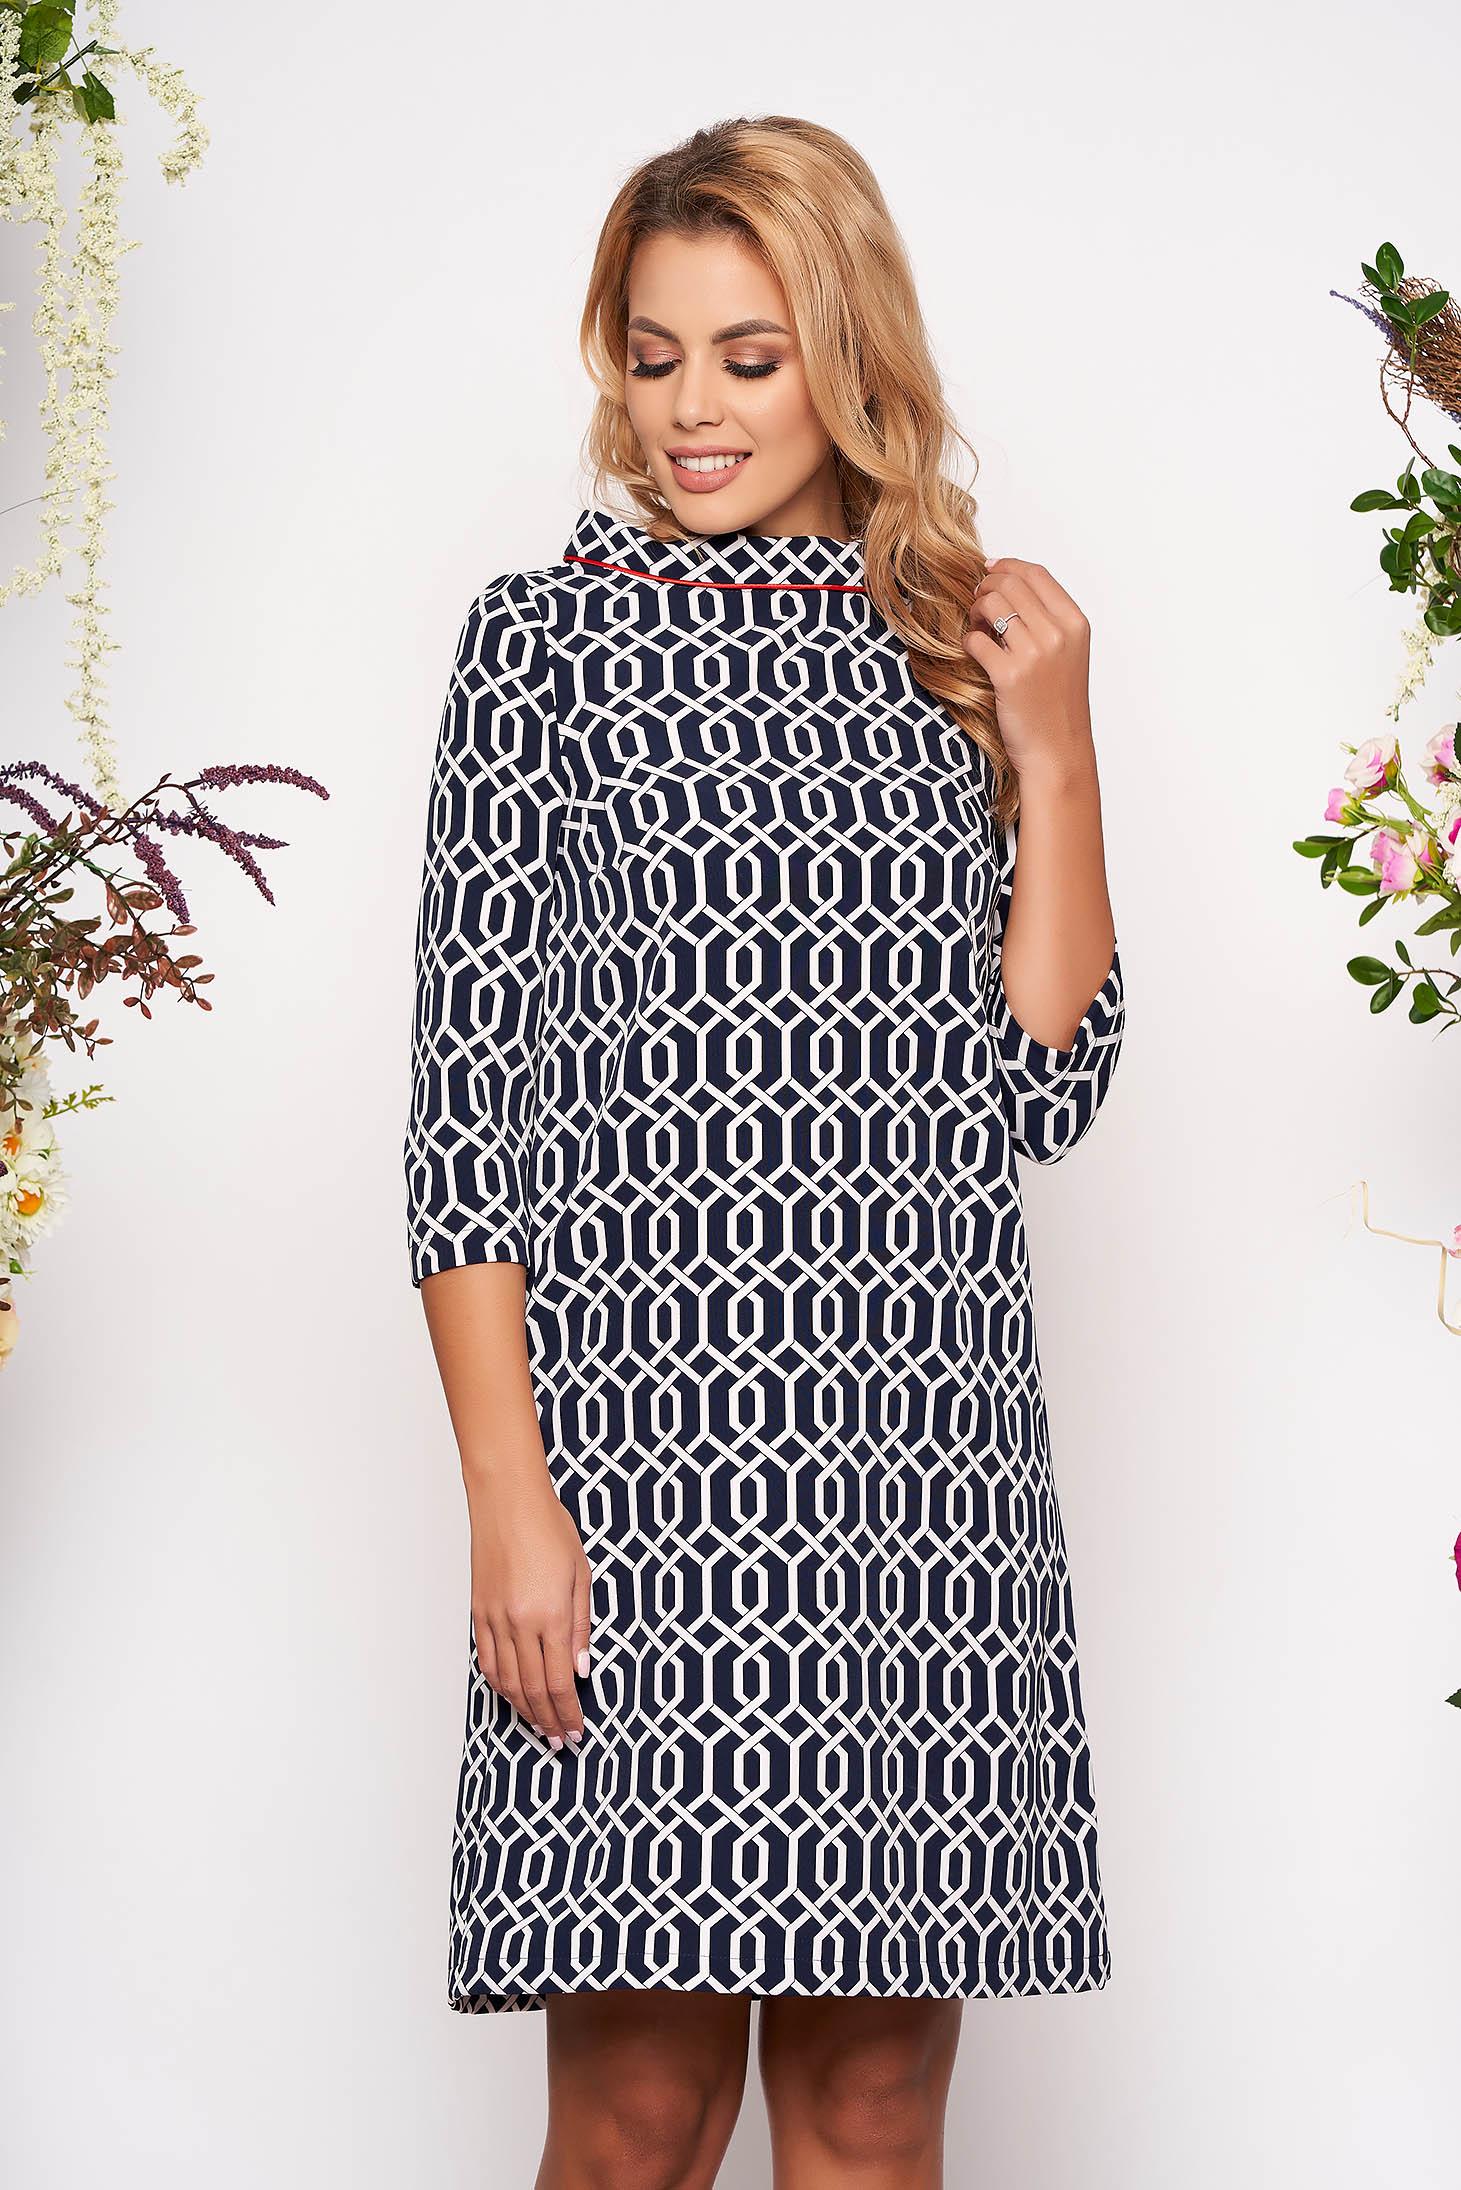 StarShinerS darkblue daily flared dress 3/4 sleeve slightly elastic fabric